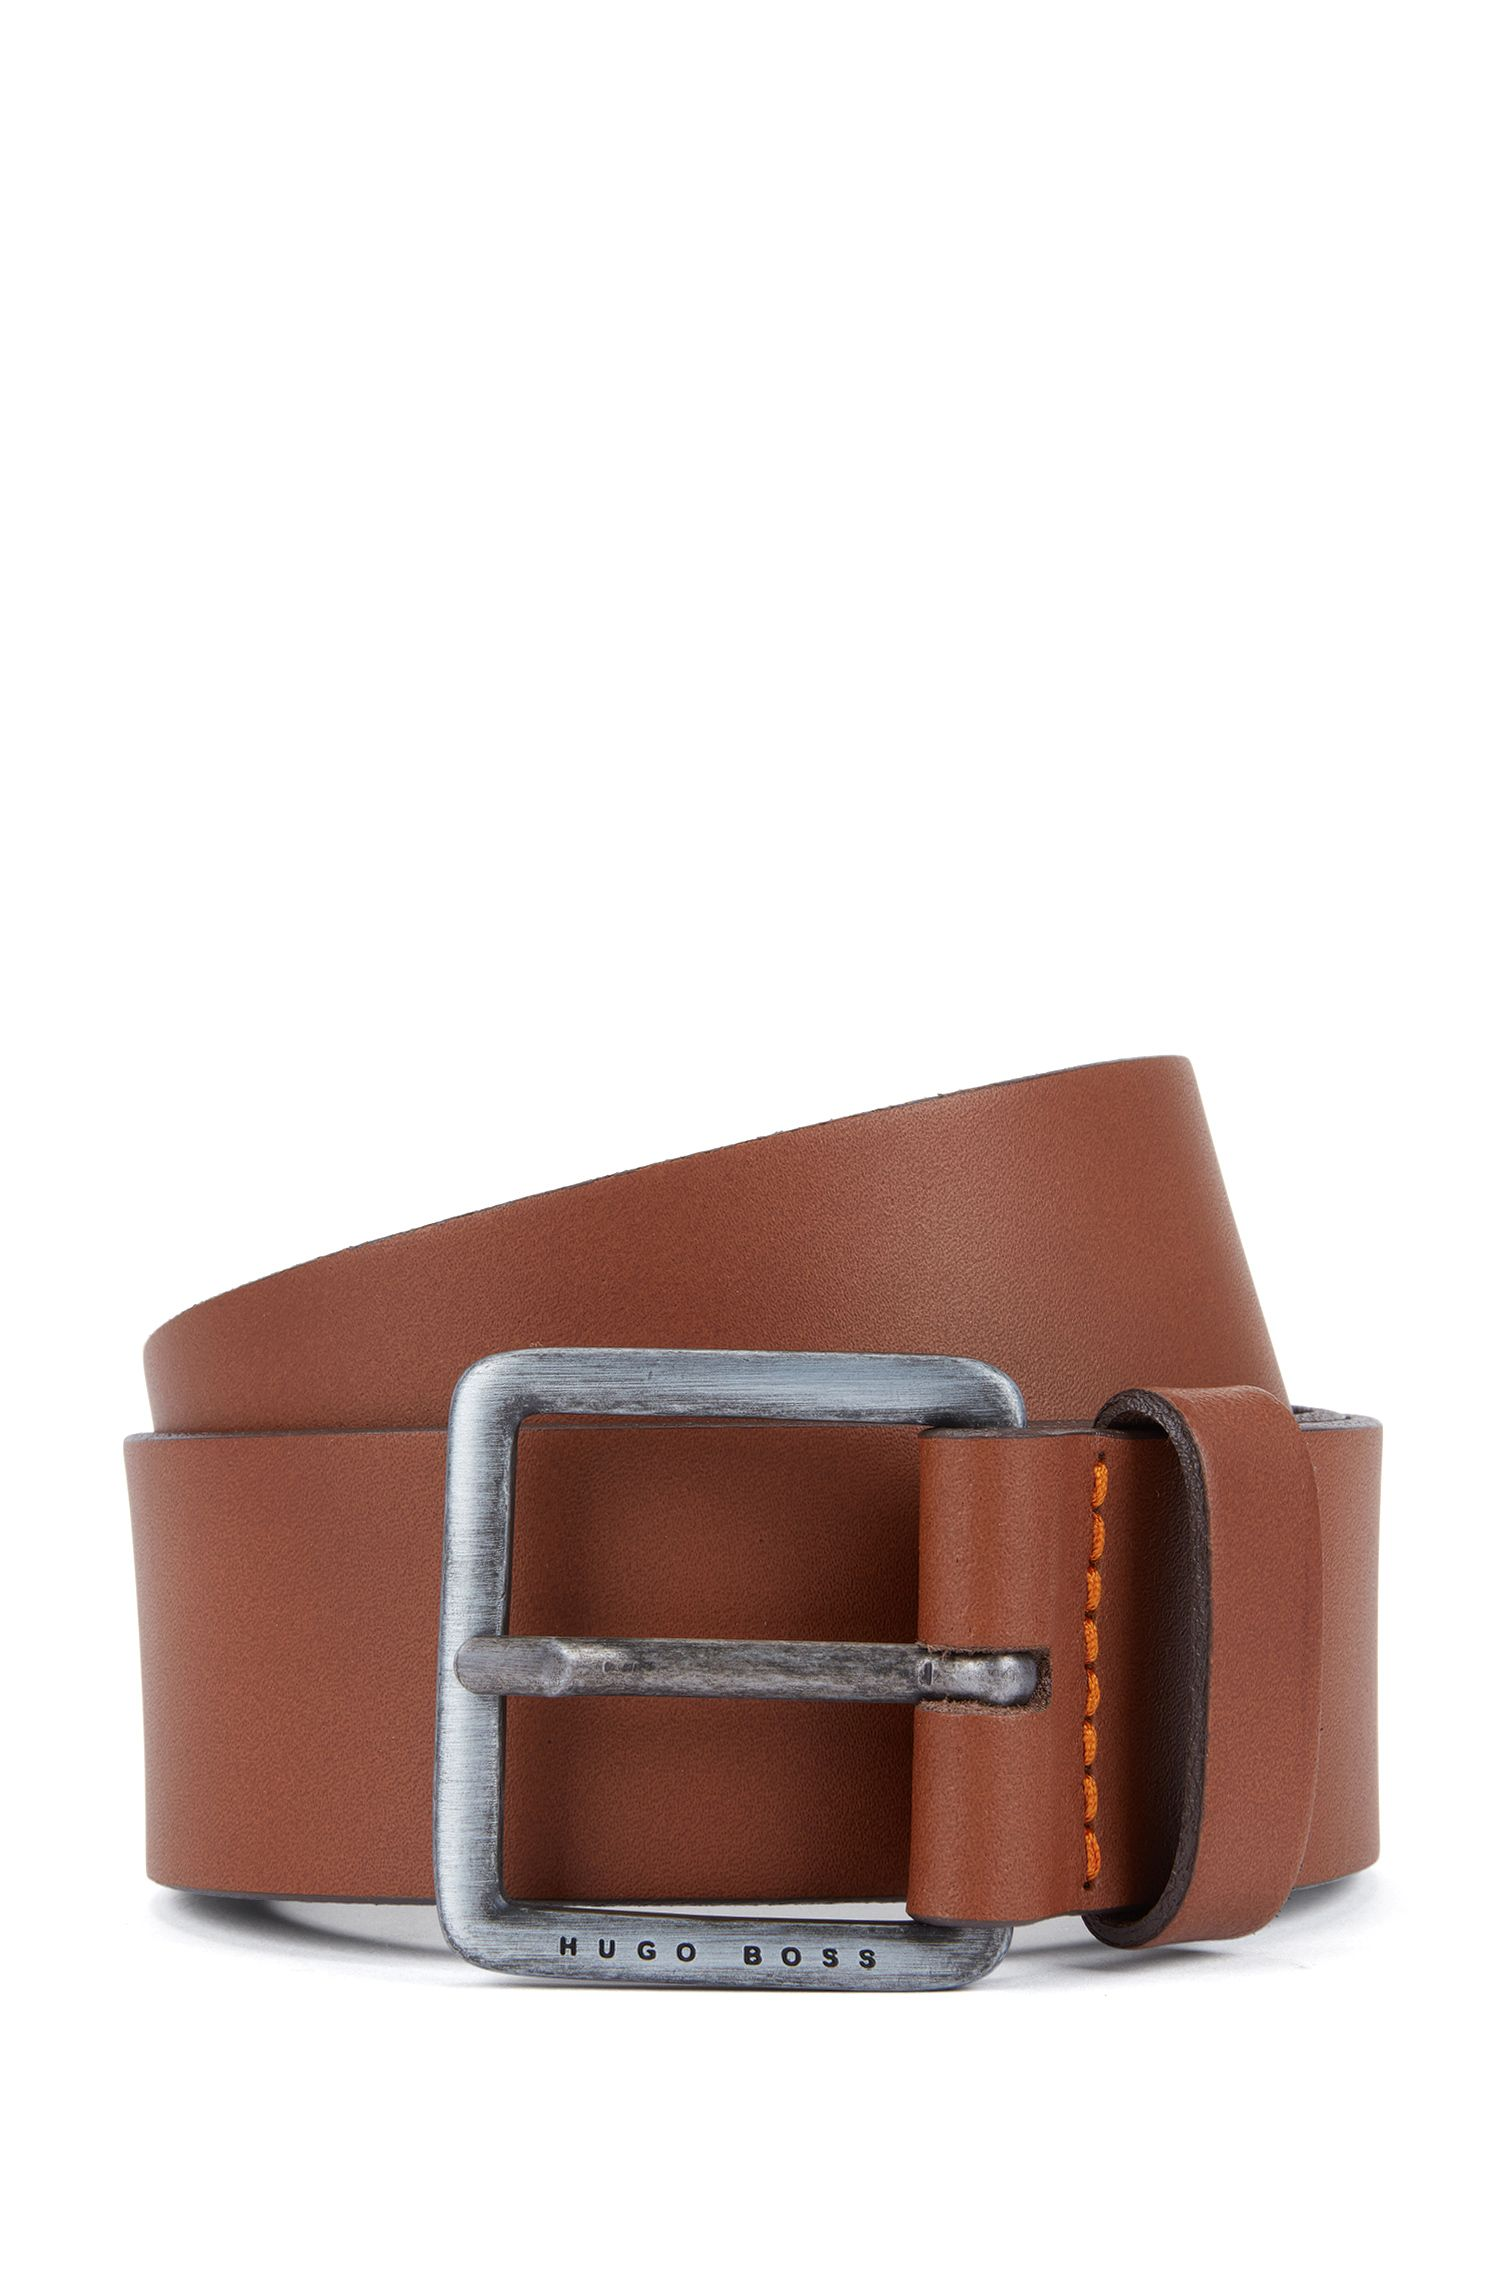 Leather belt with signature stitching